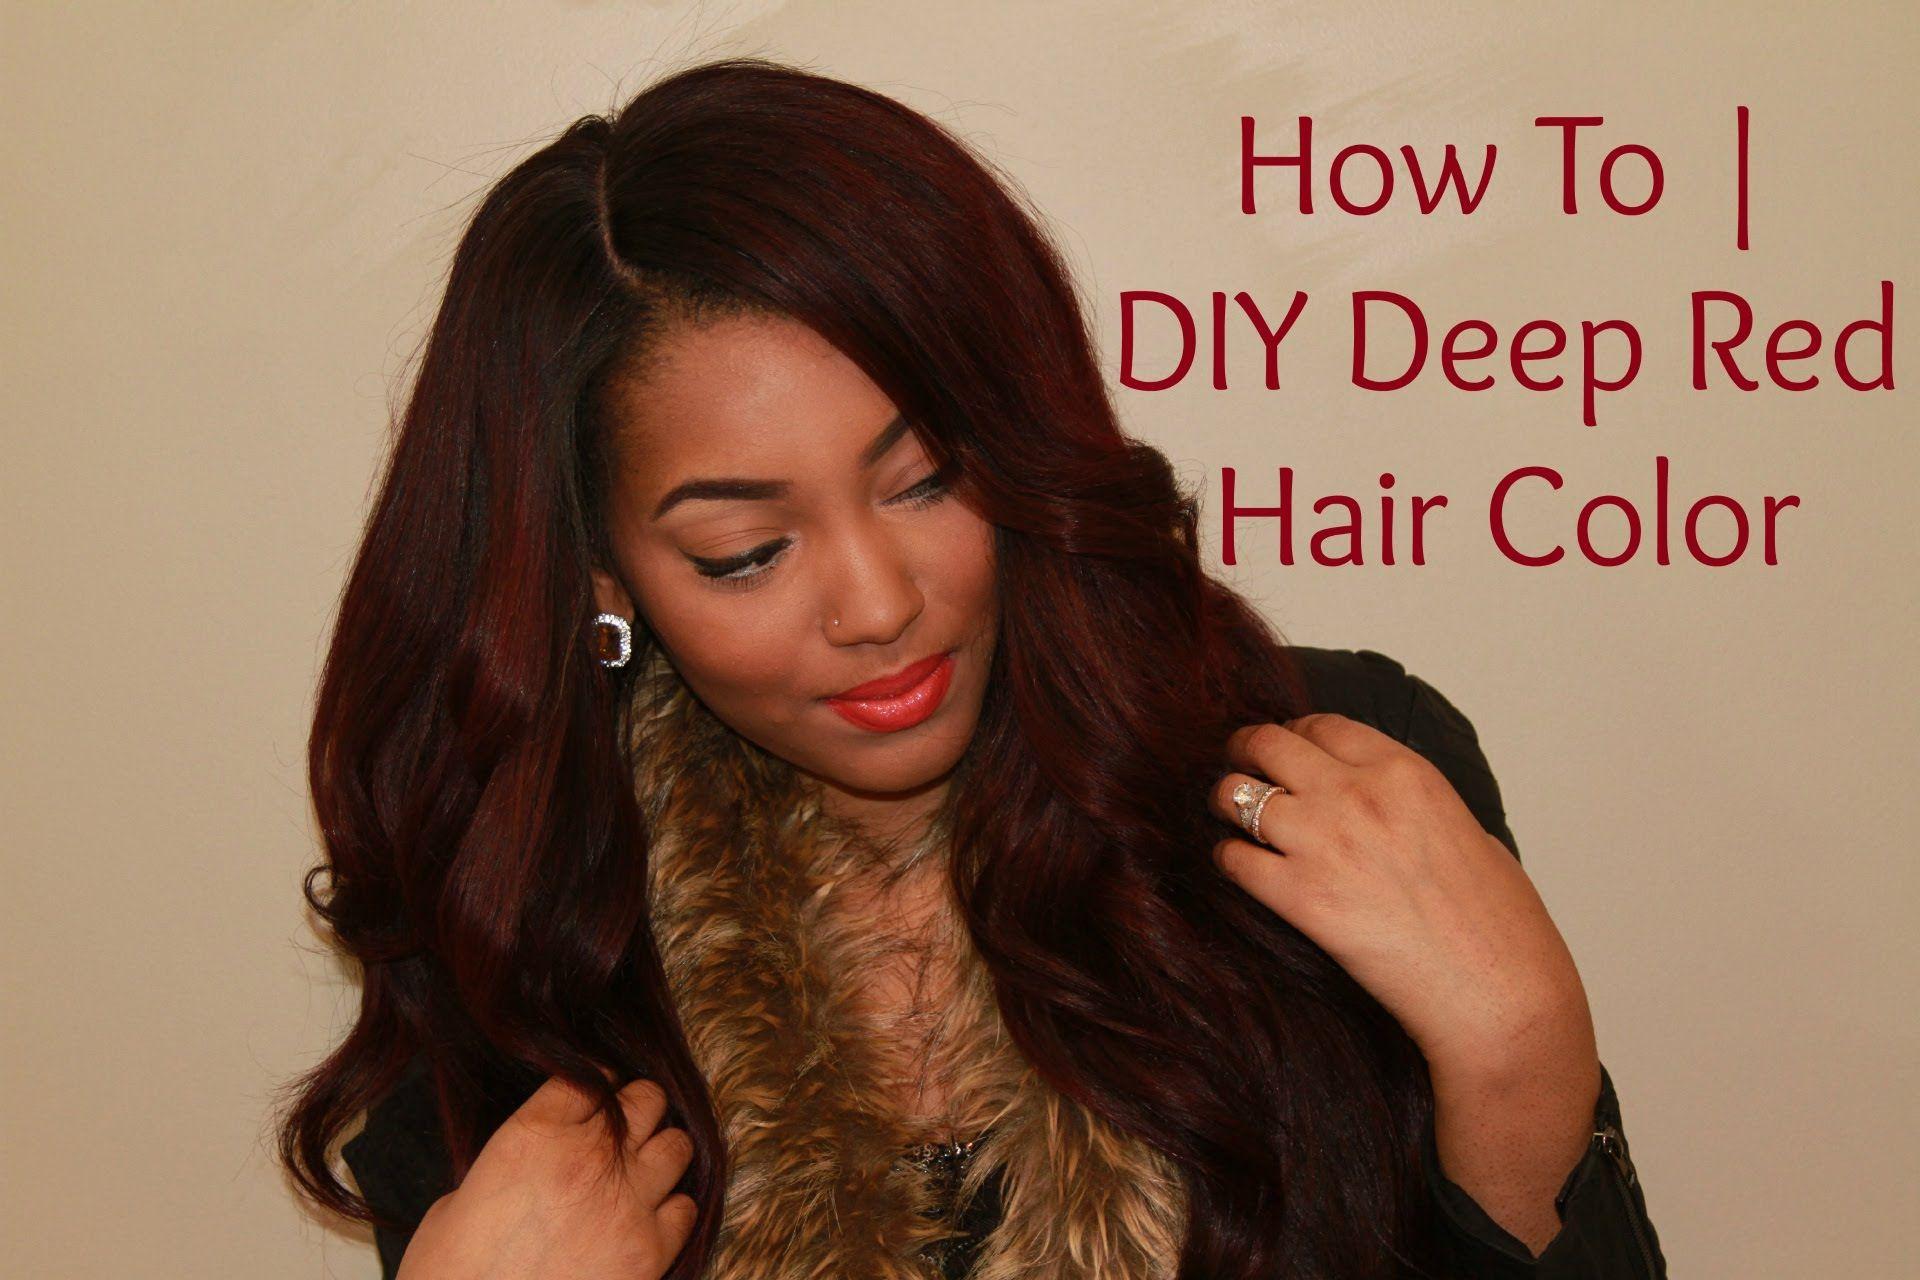 Pin By Lauren Harden On Hair Inspiration Deep Red Hair Deep Red Hair Color Red Hair Color